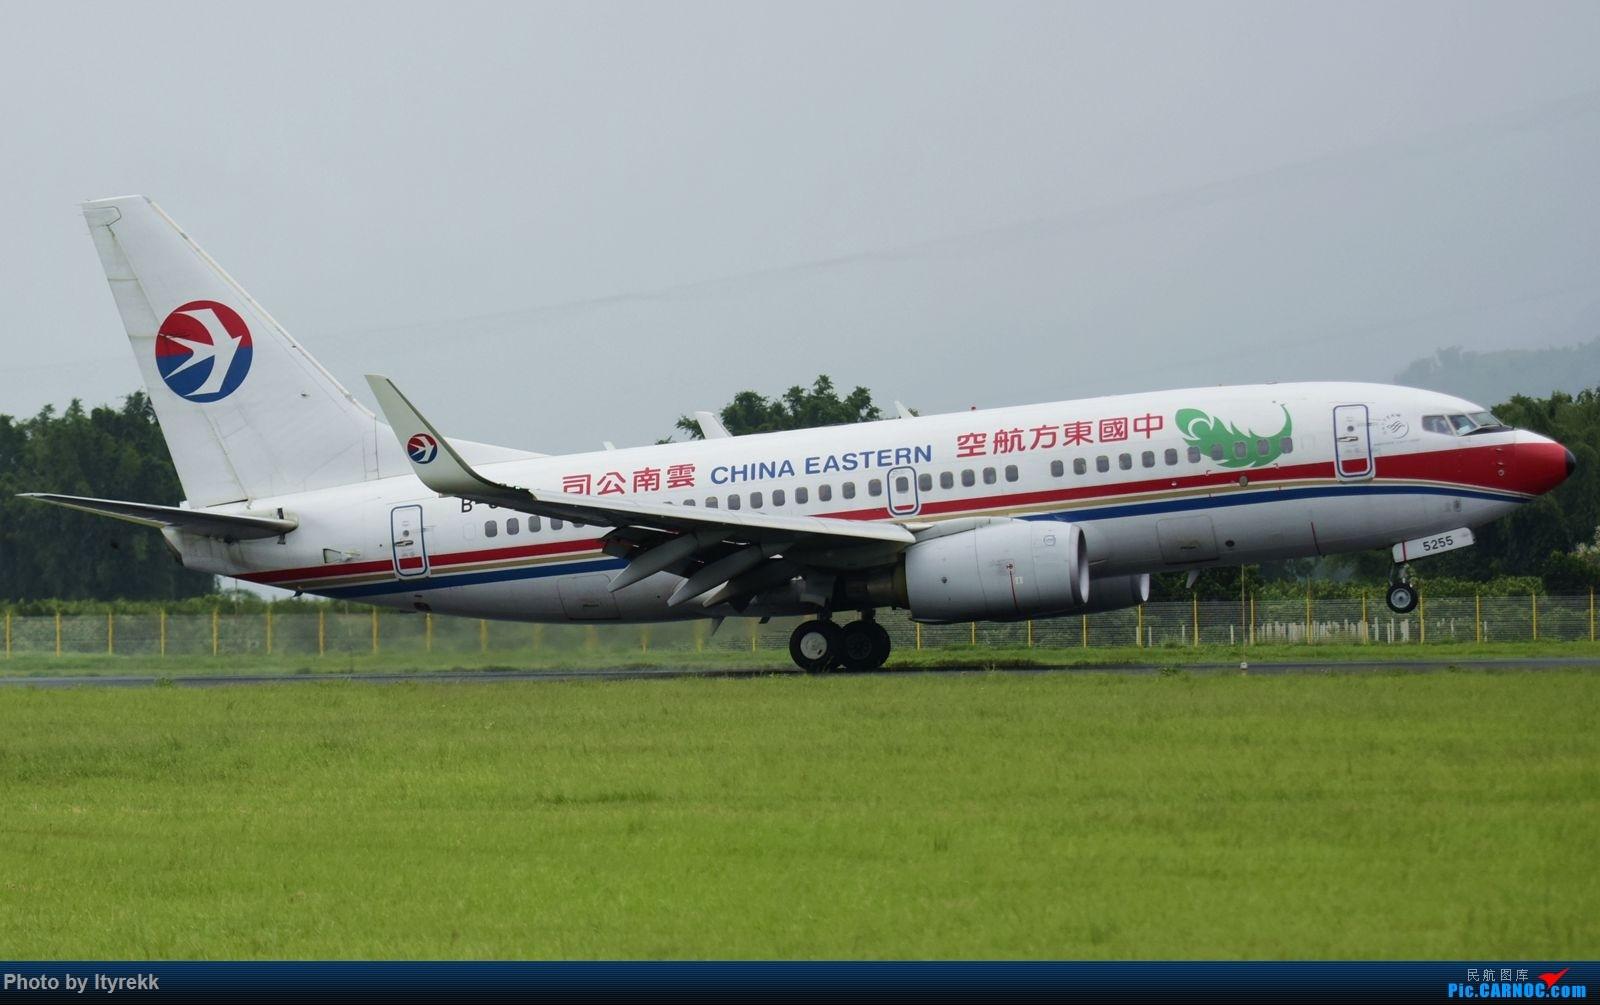 Re:[原创]怀念暑假时飞友们在一起拍机的日子 BOEING 737-700 B-5255 中国芒市机场